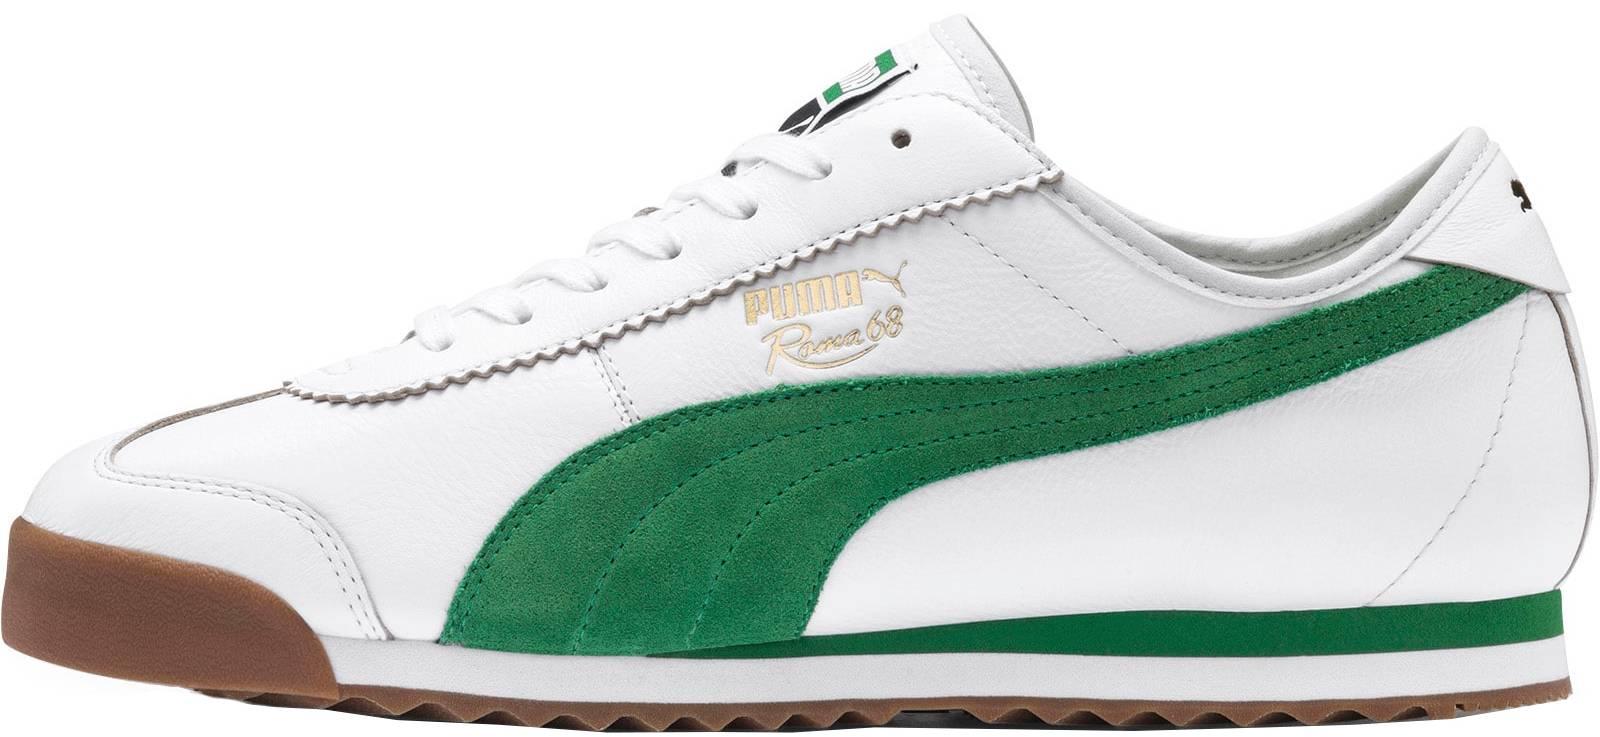 Puma Roma 68 OG sneakers | RunRepeat